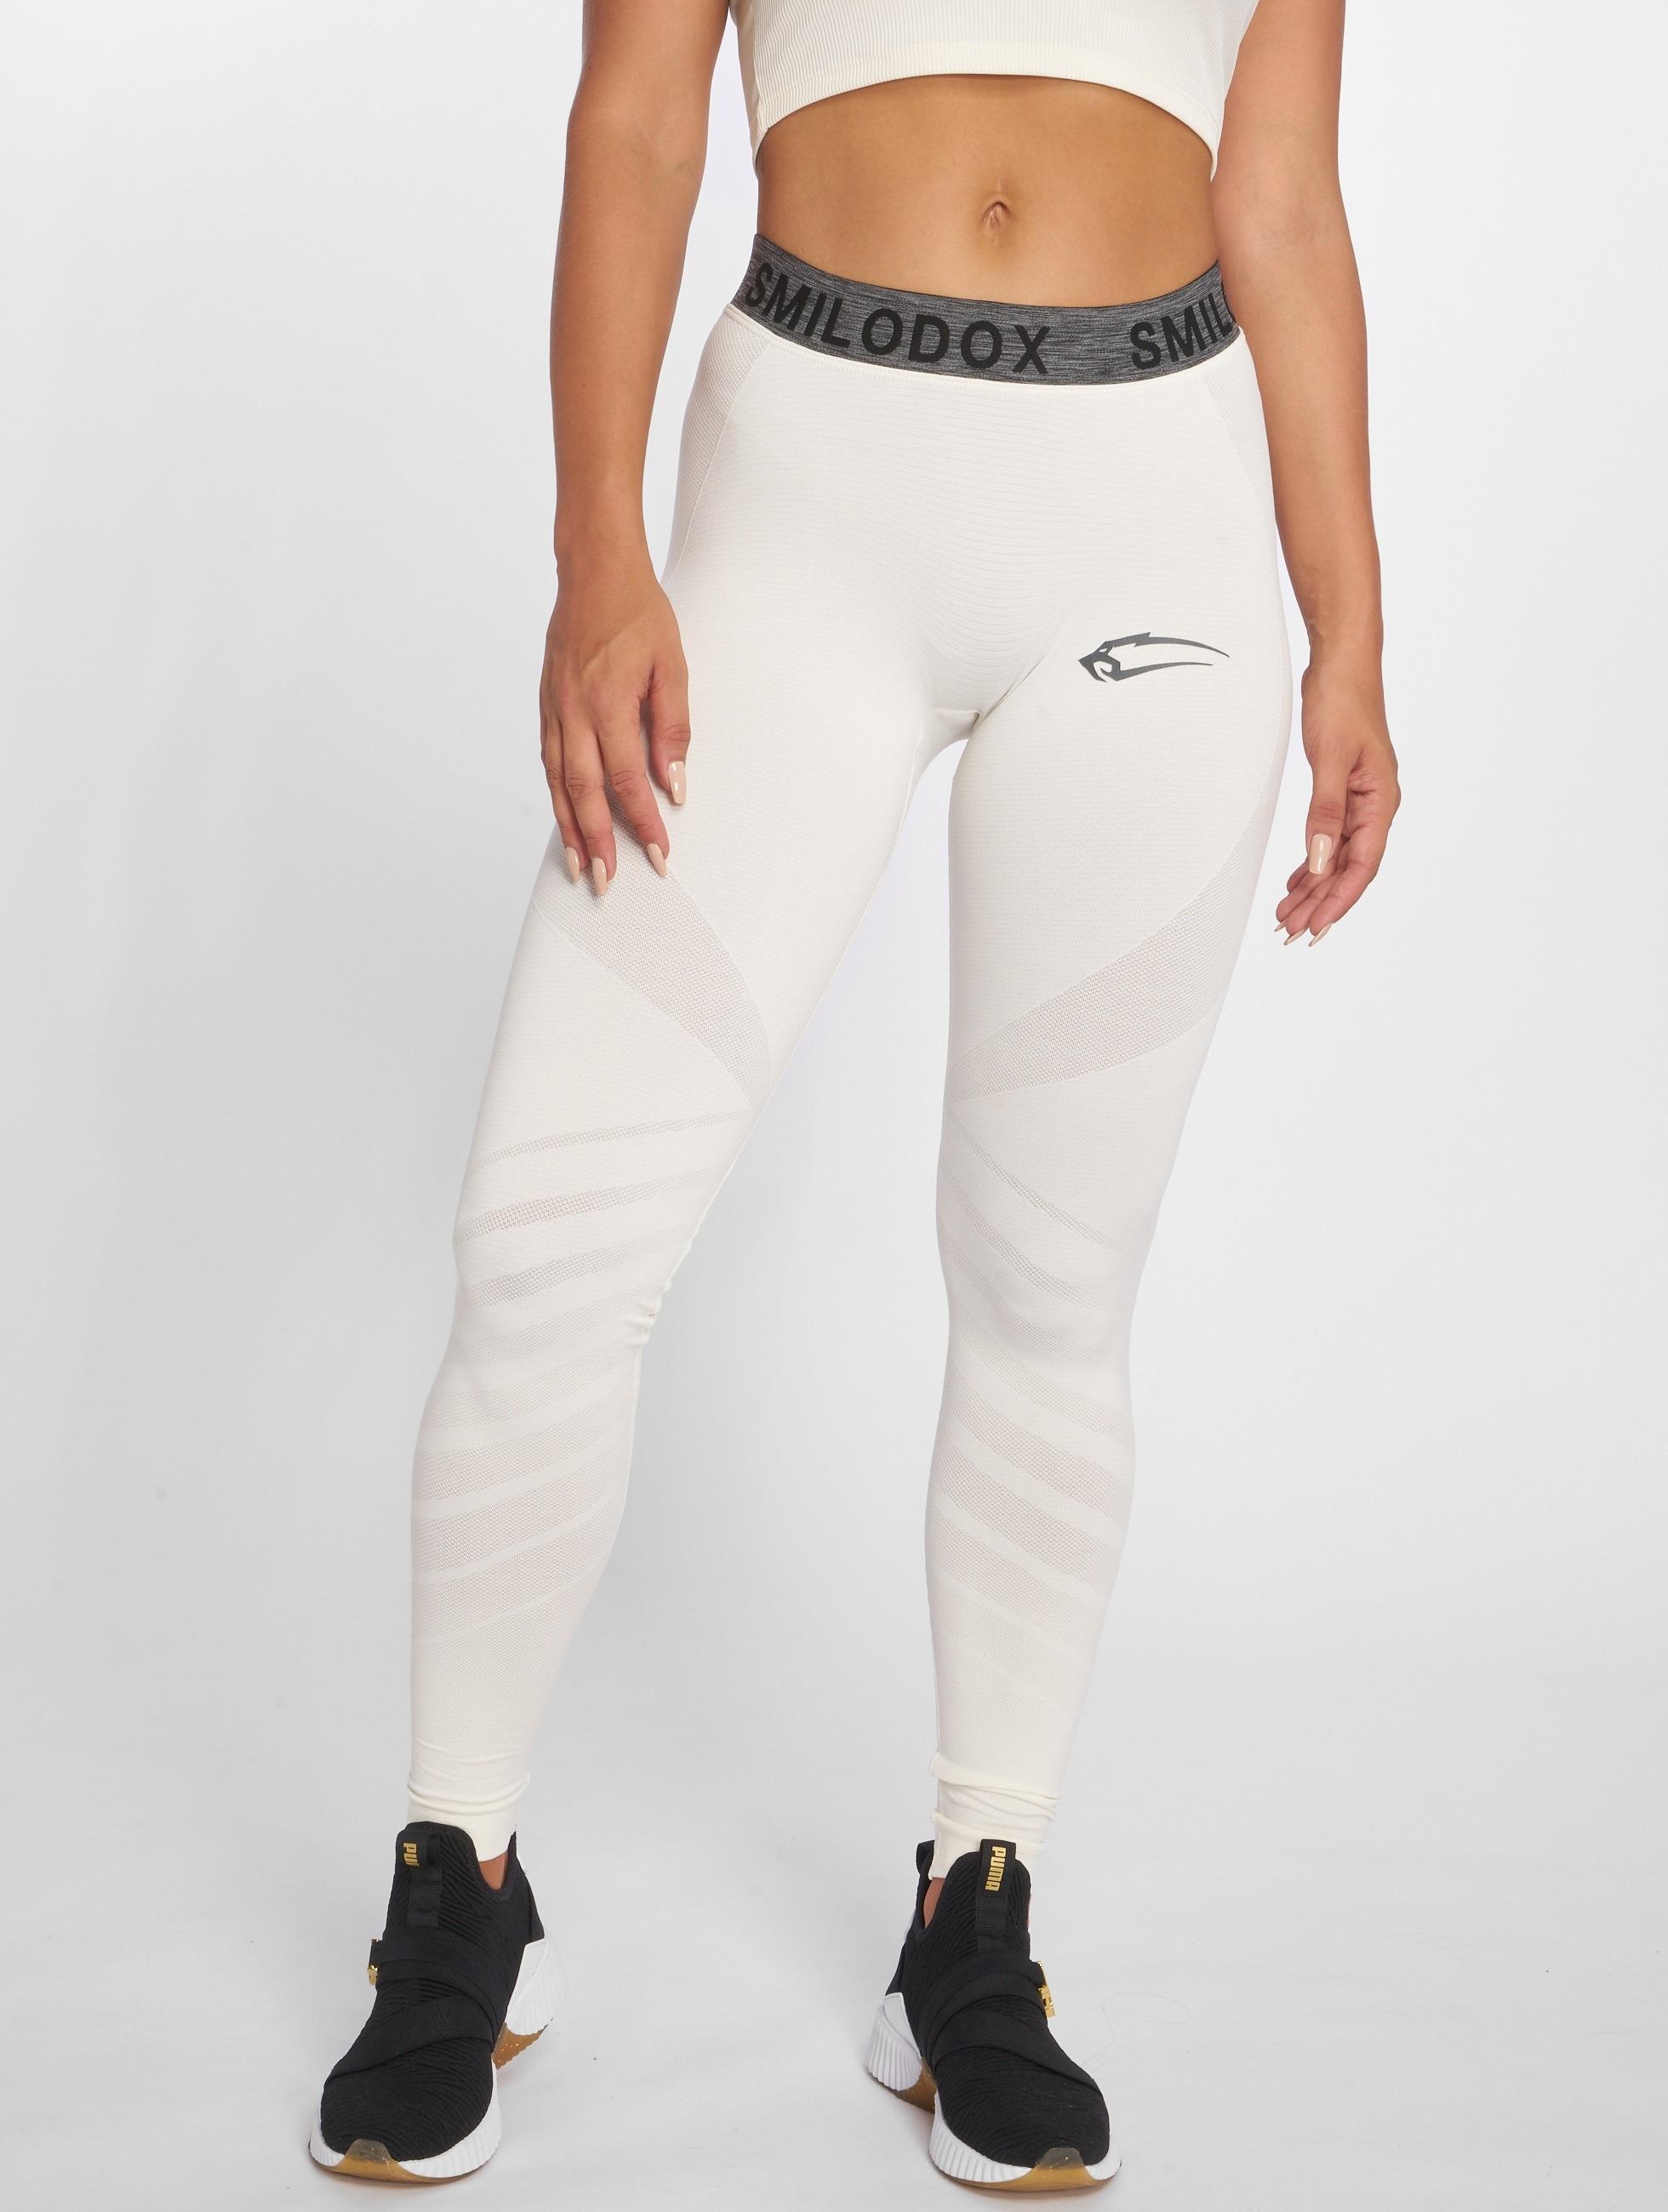 Smilodox | Seamless beige Femme Leggings de sport